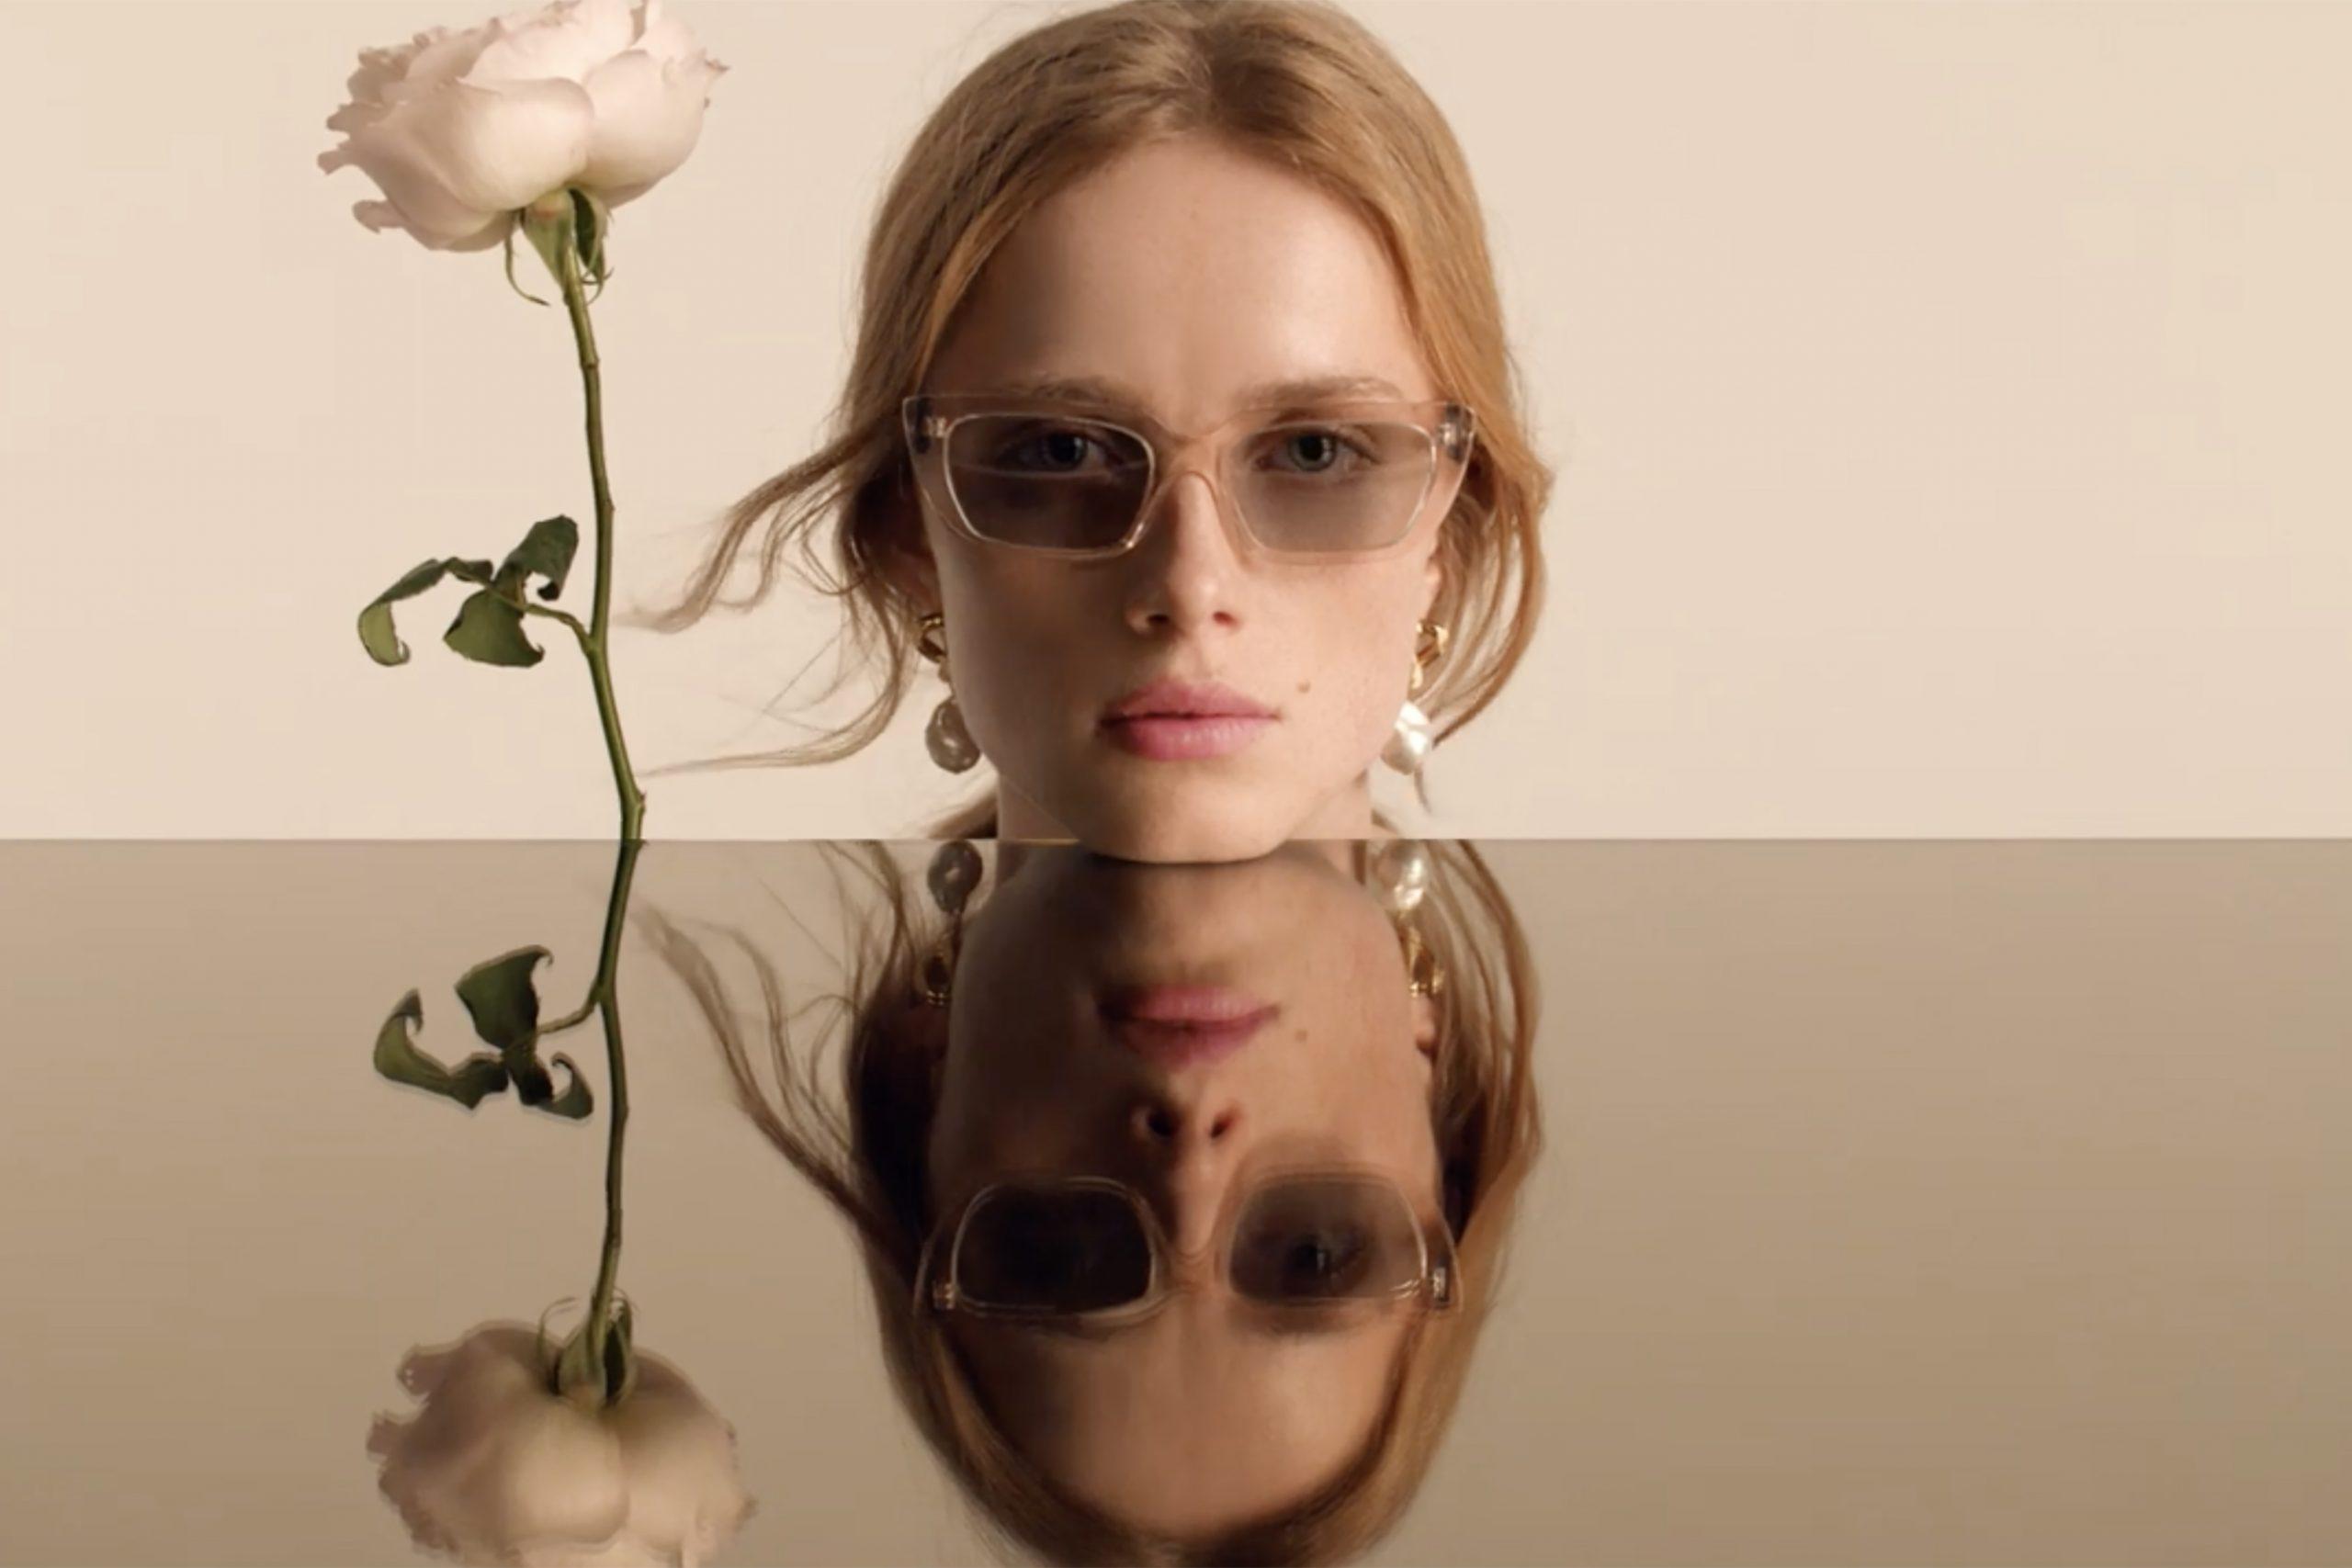 Burberry Spring 2020 Fashion Ad Campaign Film